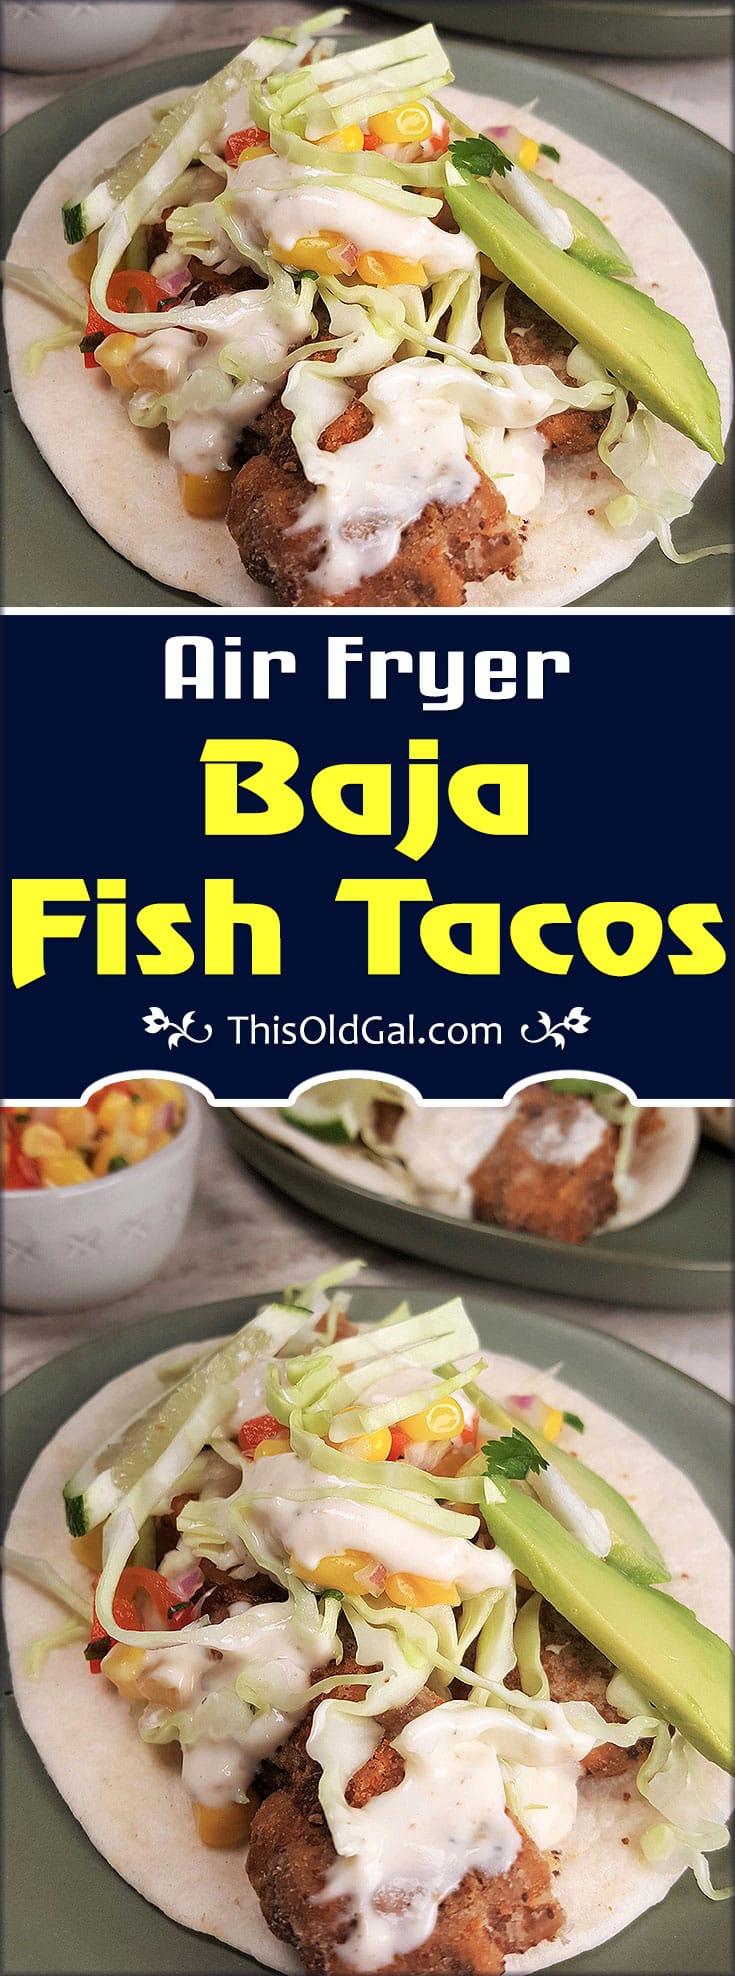 Air Fryer Baja California Fish Tacos